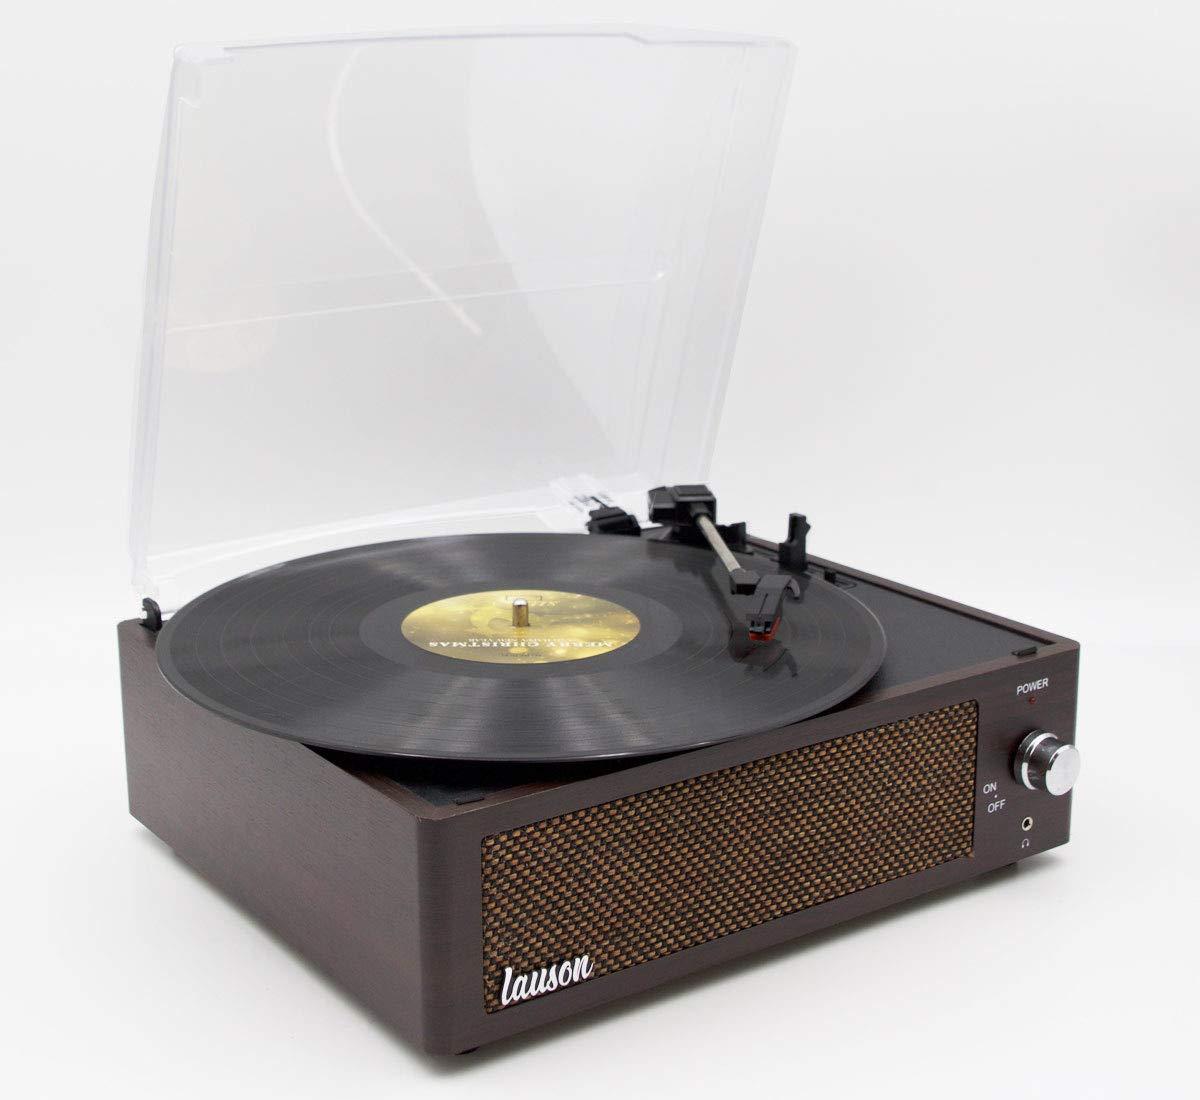 Amazon.com: Lauson XN5 - Reproductor de vinilos con altavoz ...